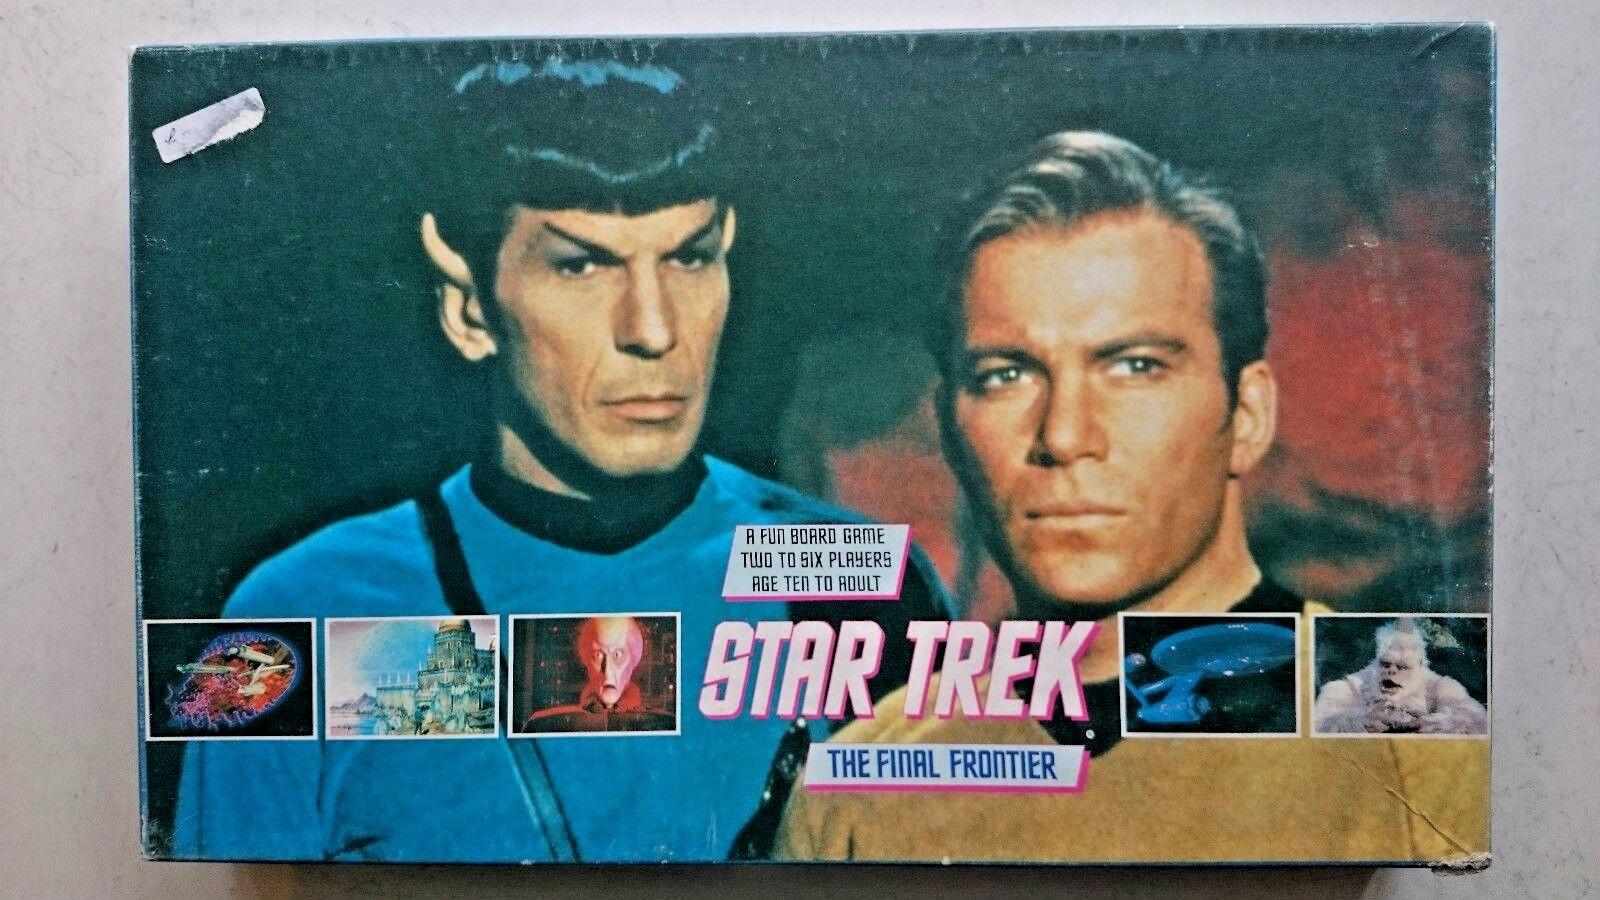 Star Trek The Final Frontier - by BMI  (1992)